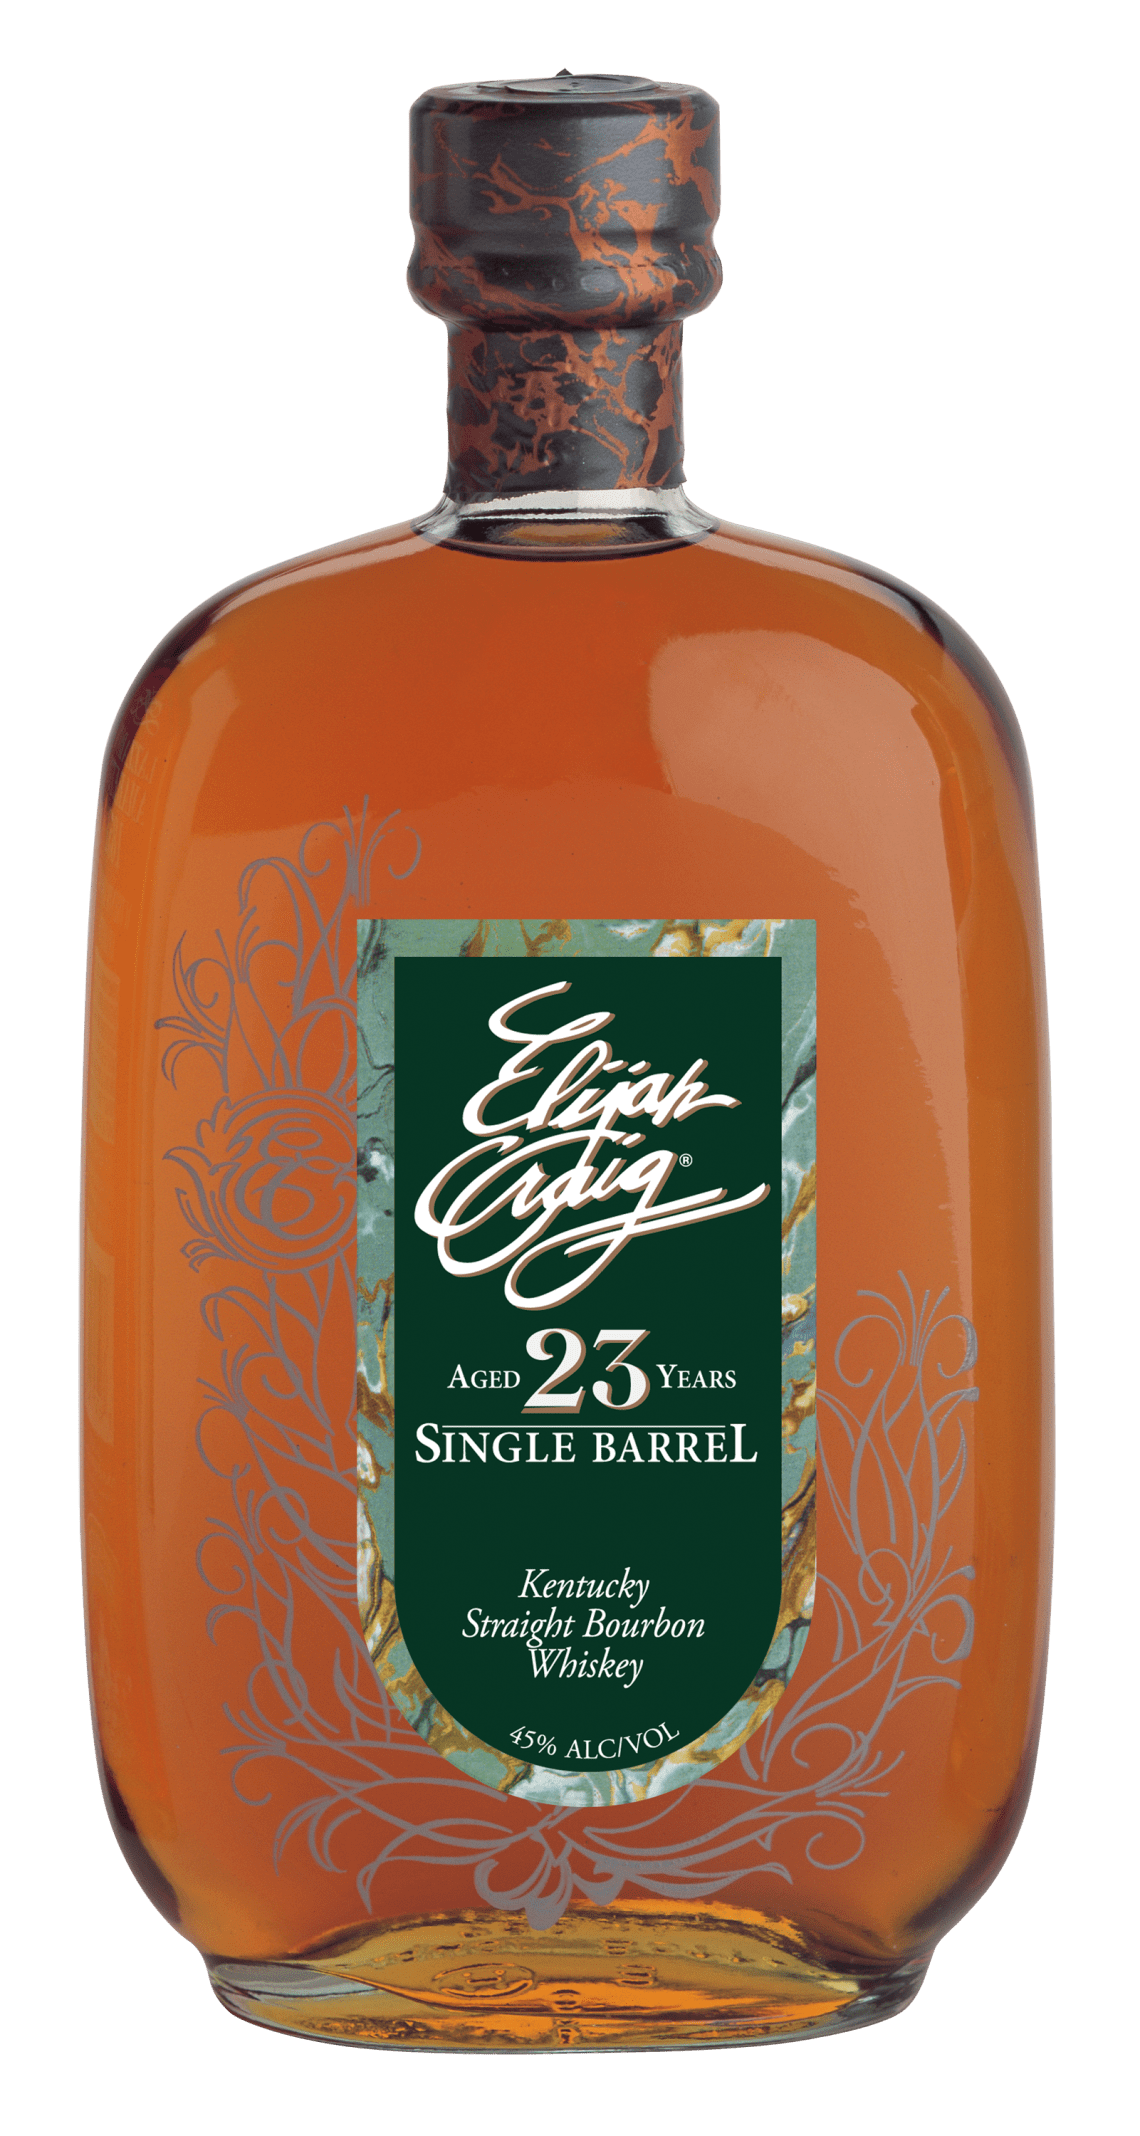 Elijah Craig Single Barrel Bourbon 23 Years Old